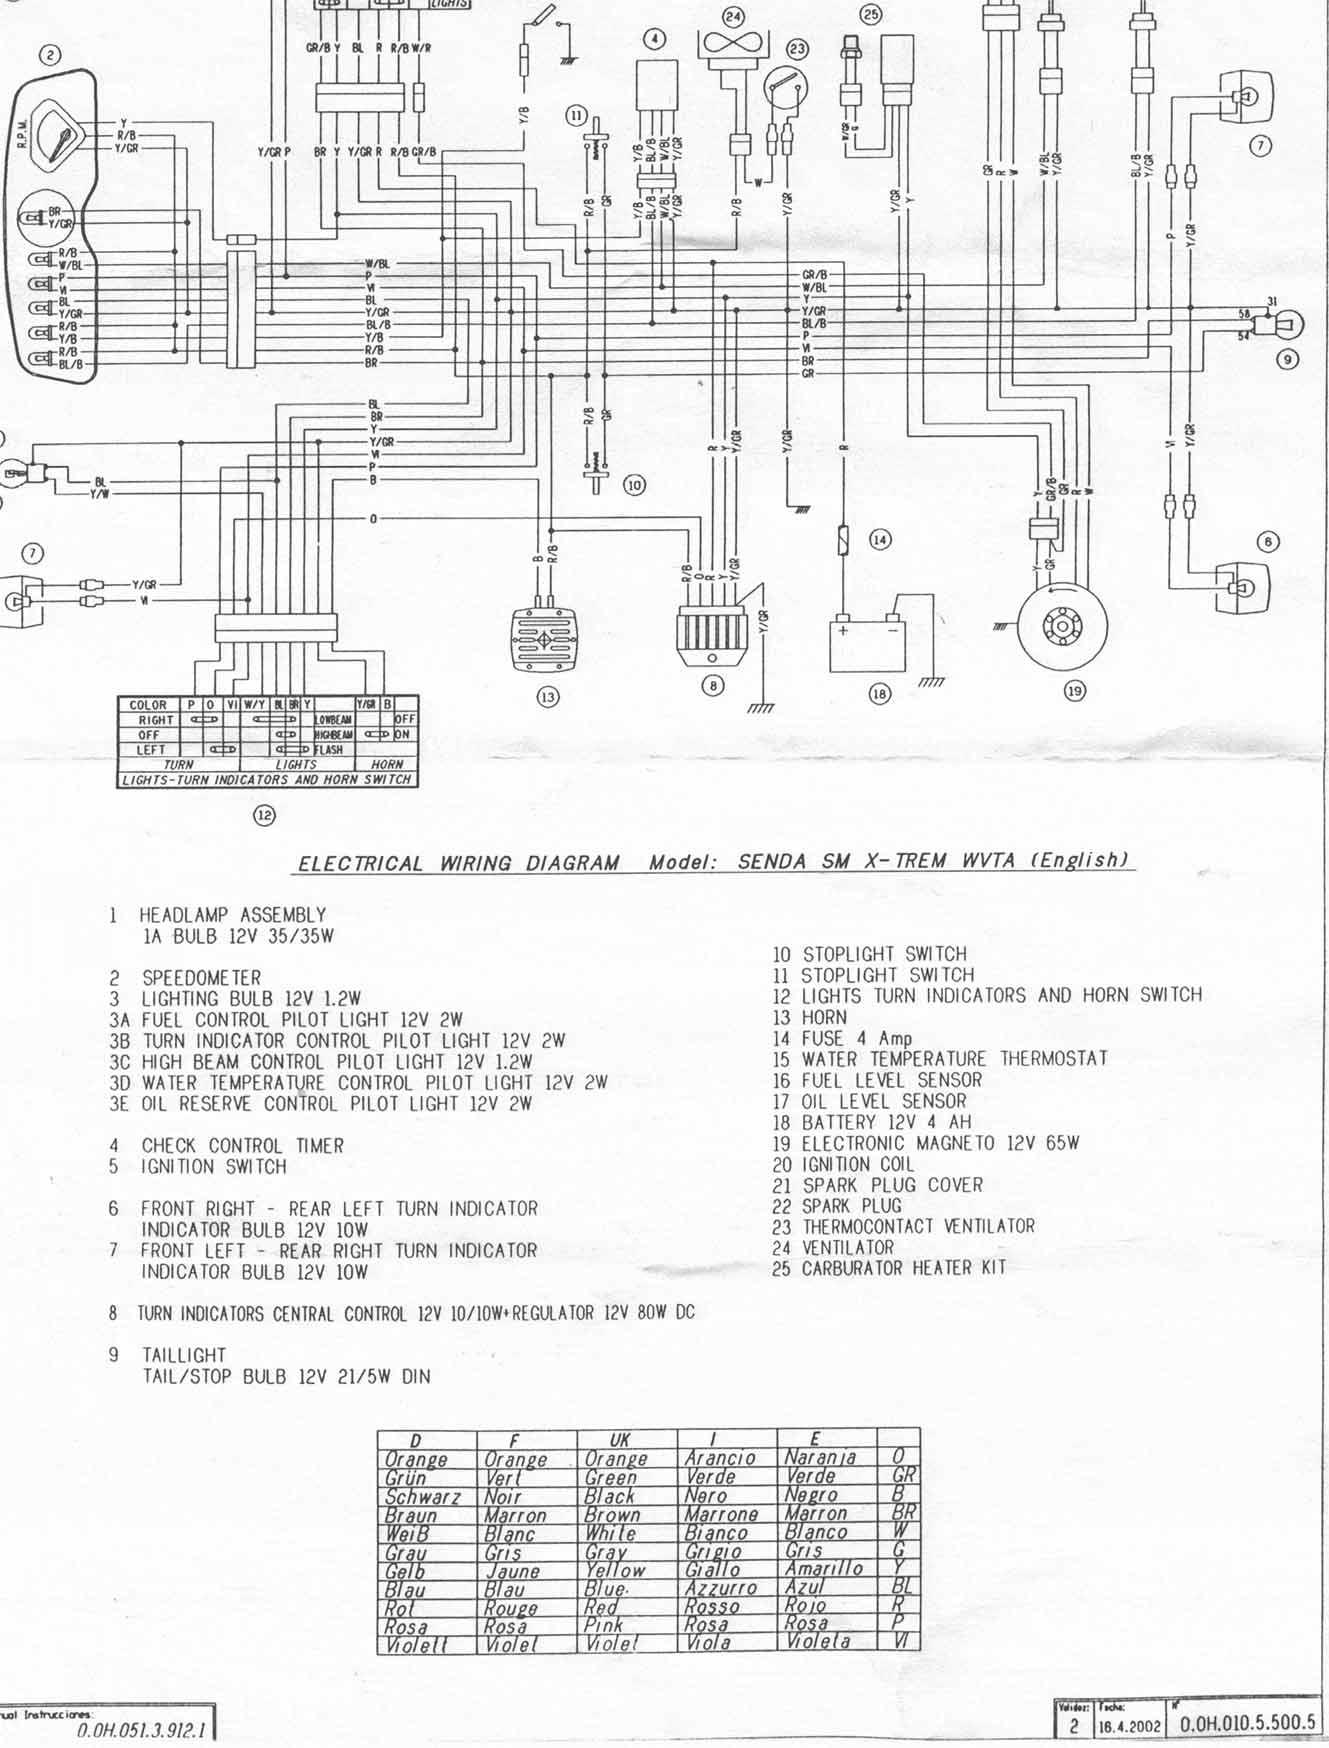 Fantastisch S10 Kabelbaumdiagramm Ideen - Schaltplan Serie Circuit ...